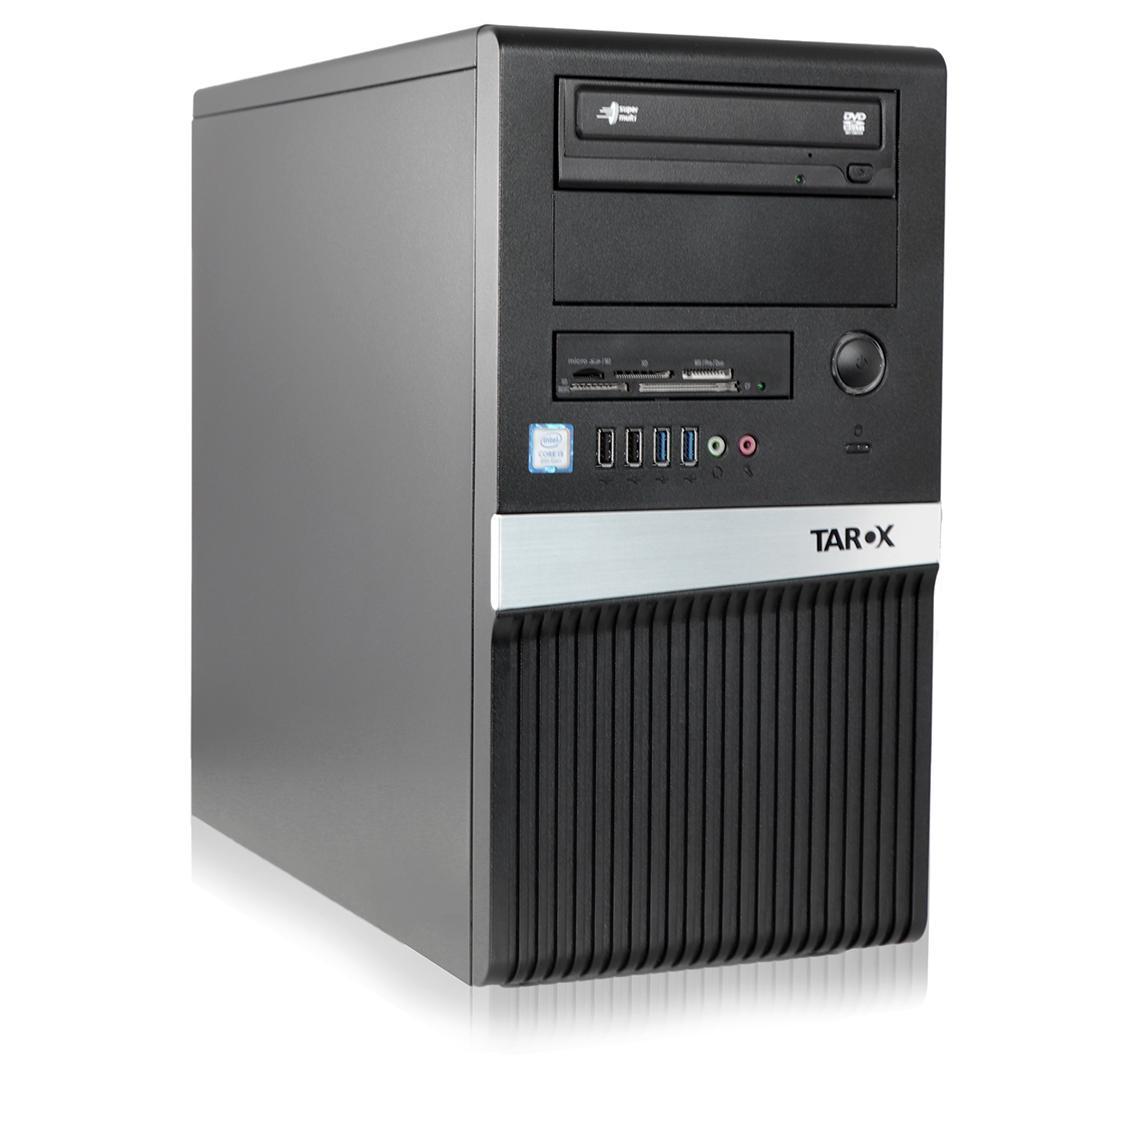 TAROX Business 3000HMV-C i3,4GB,240GB,W10P